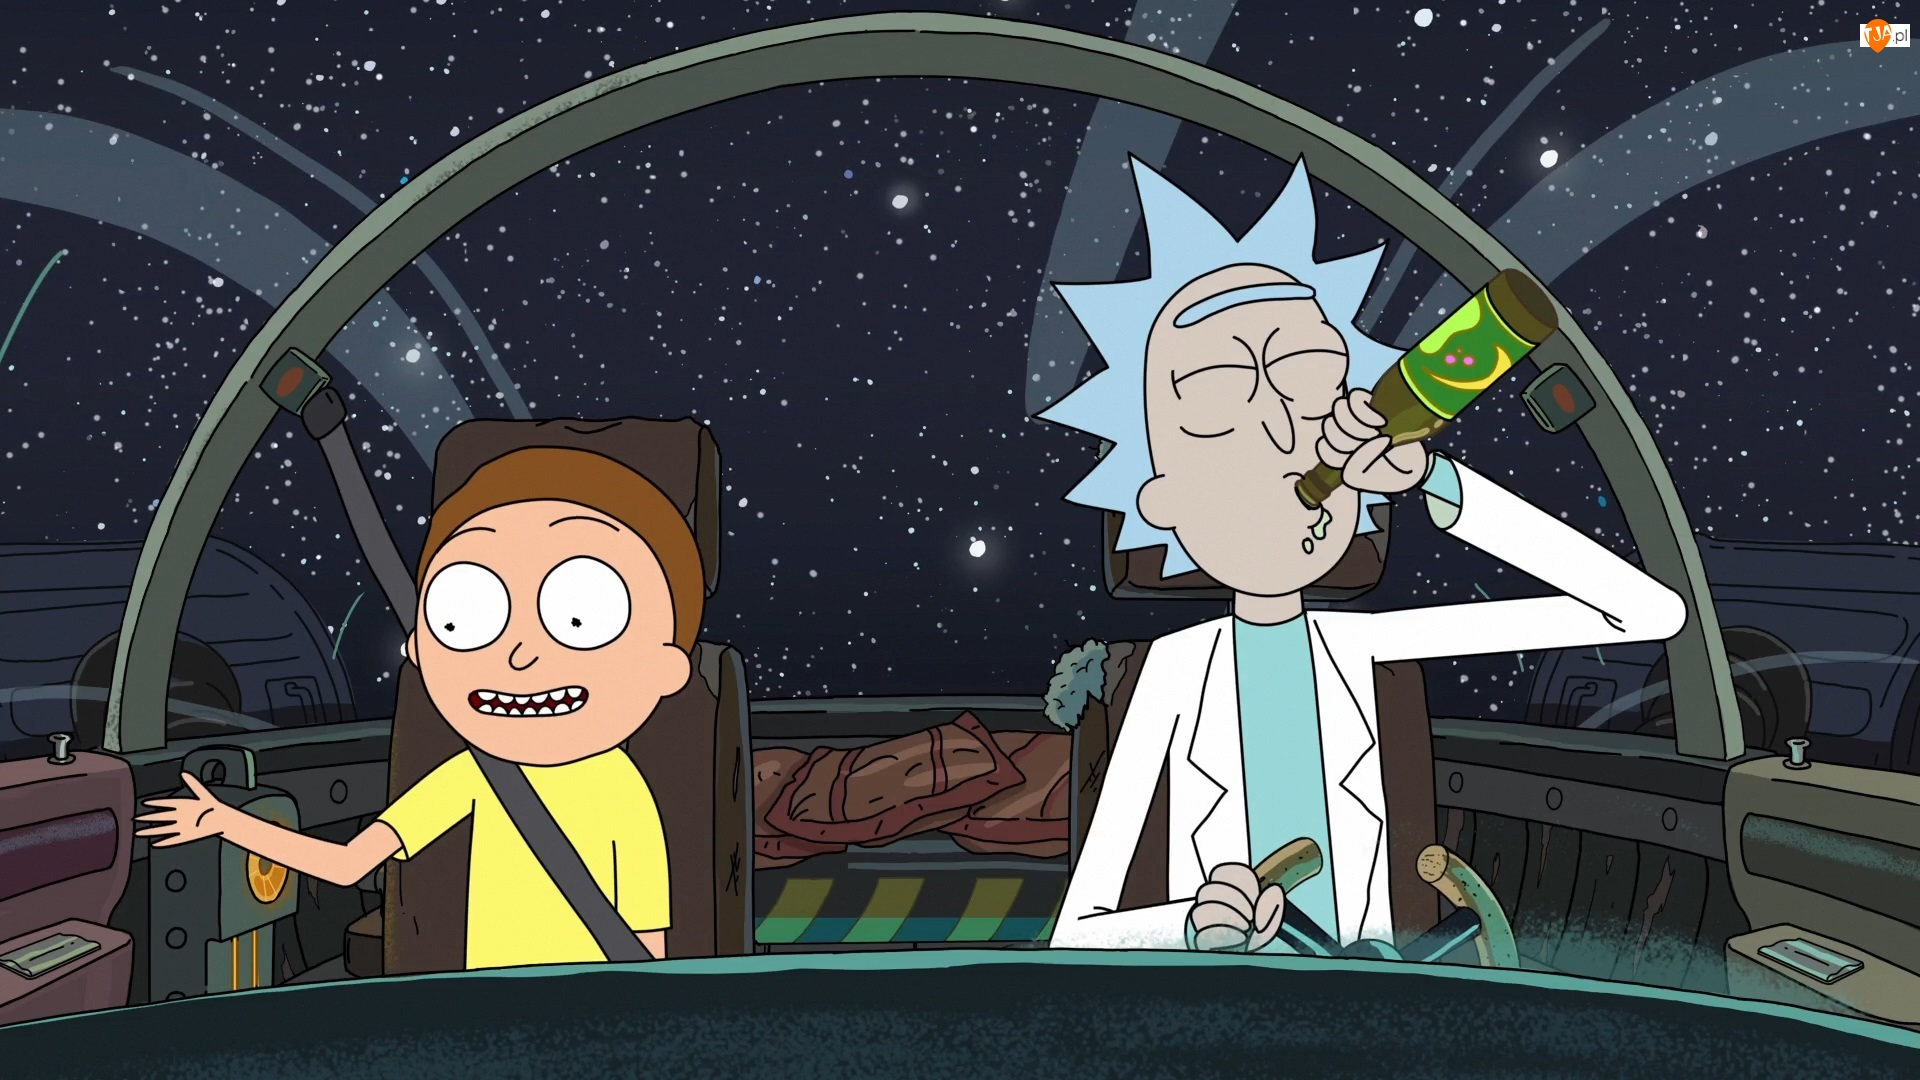 Rick i Morty, Serial animowany, Postacie